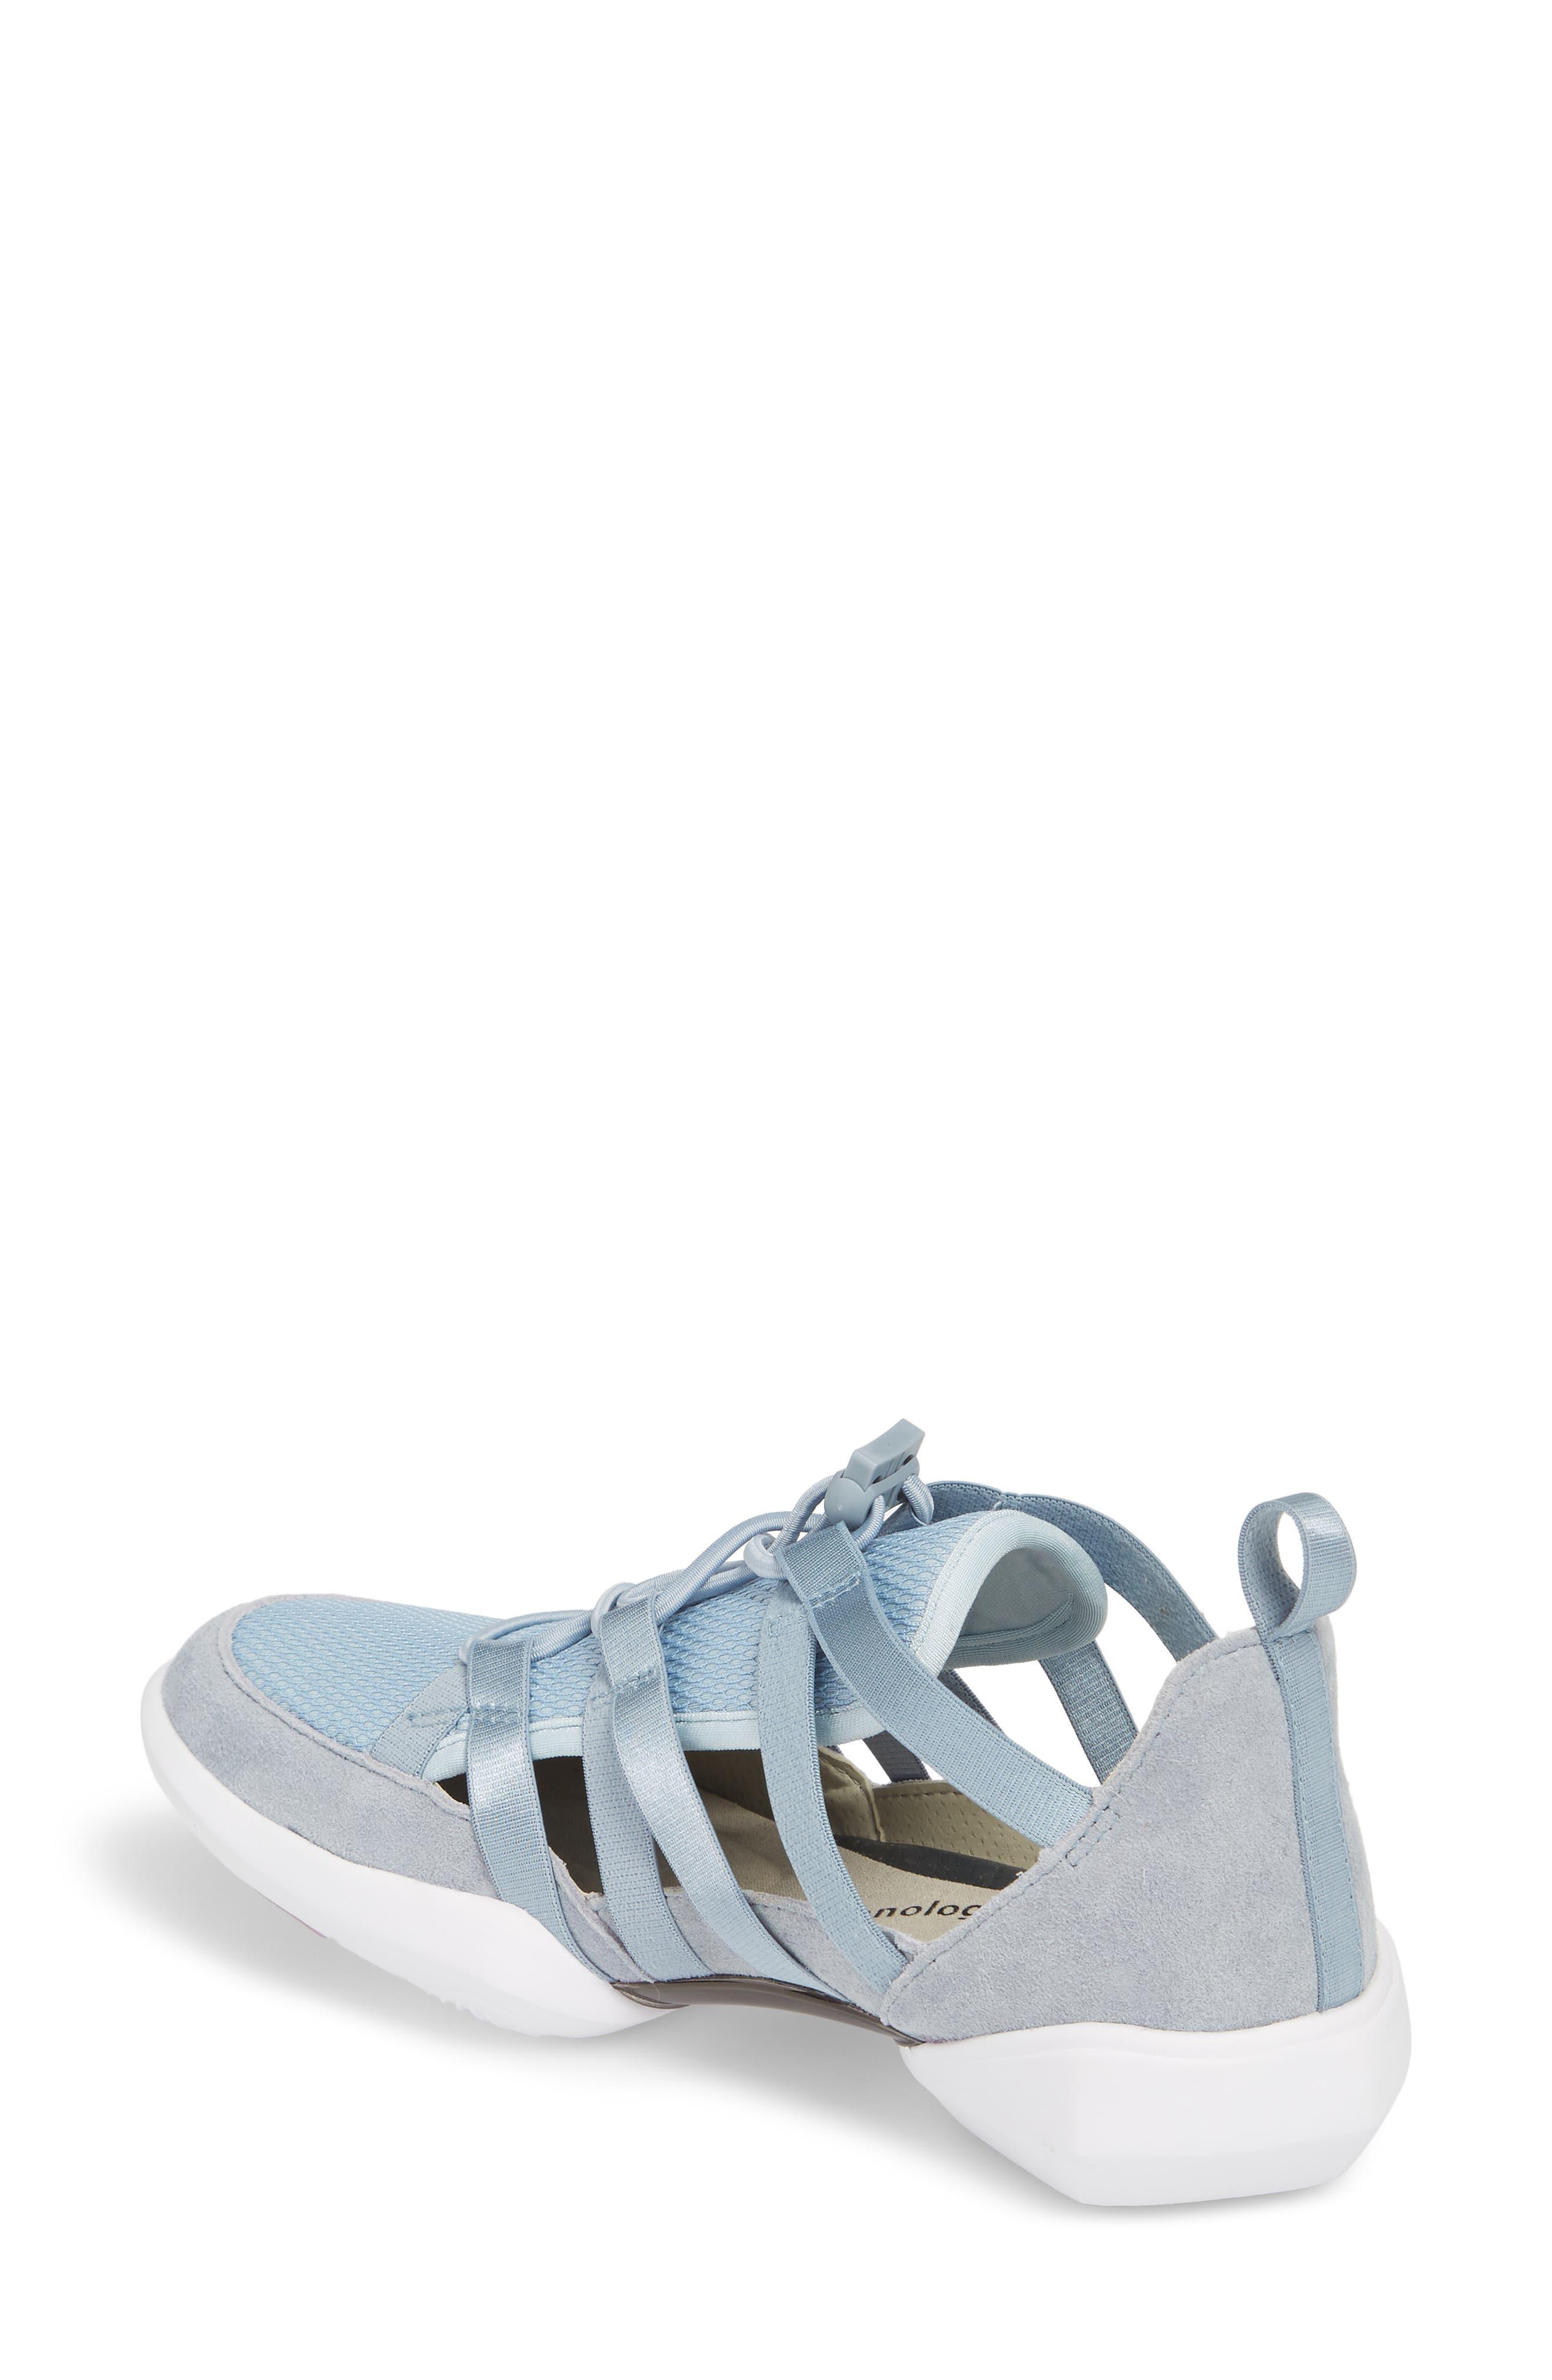 Azalea Sneaker,                             Alternate thumbnail 2, color,                             BLUE LEATHER